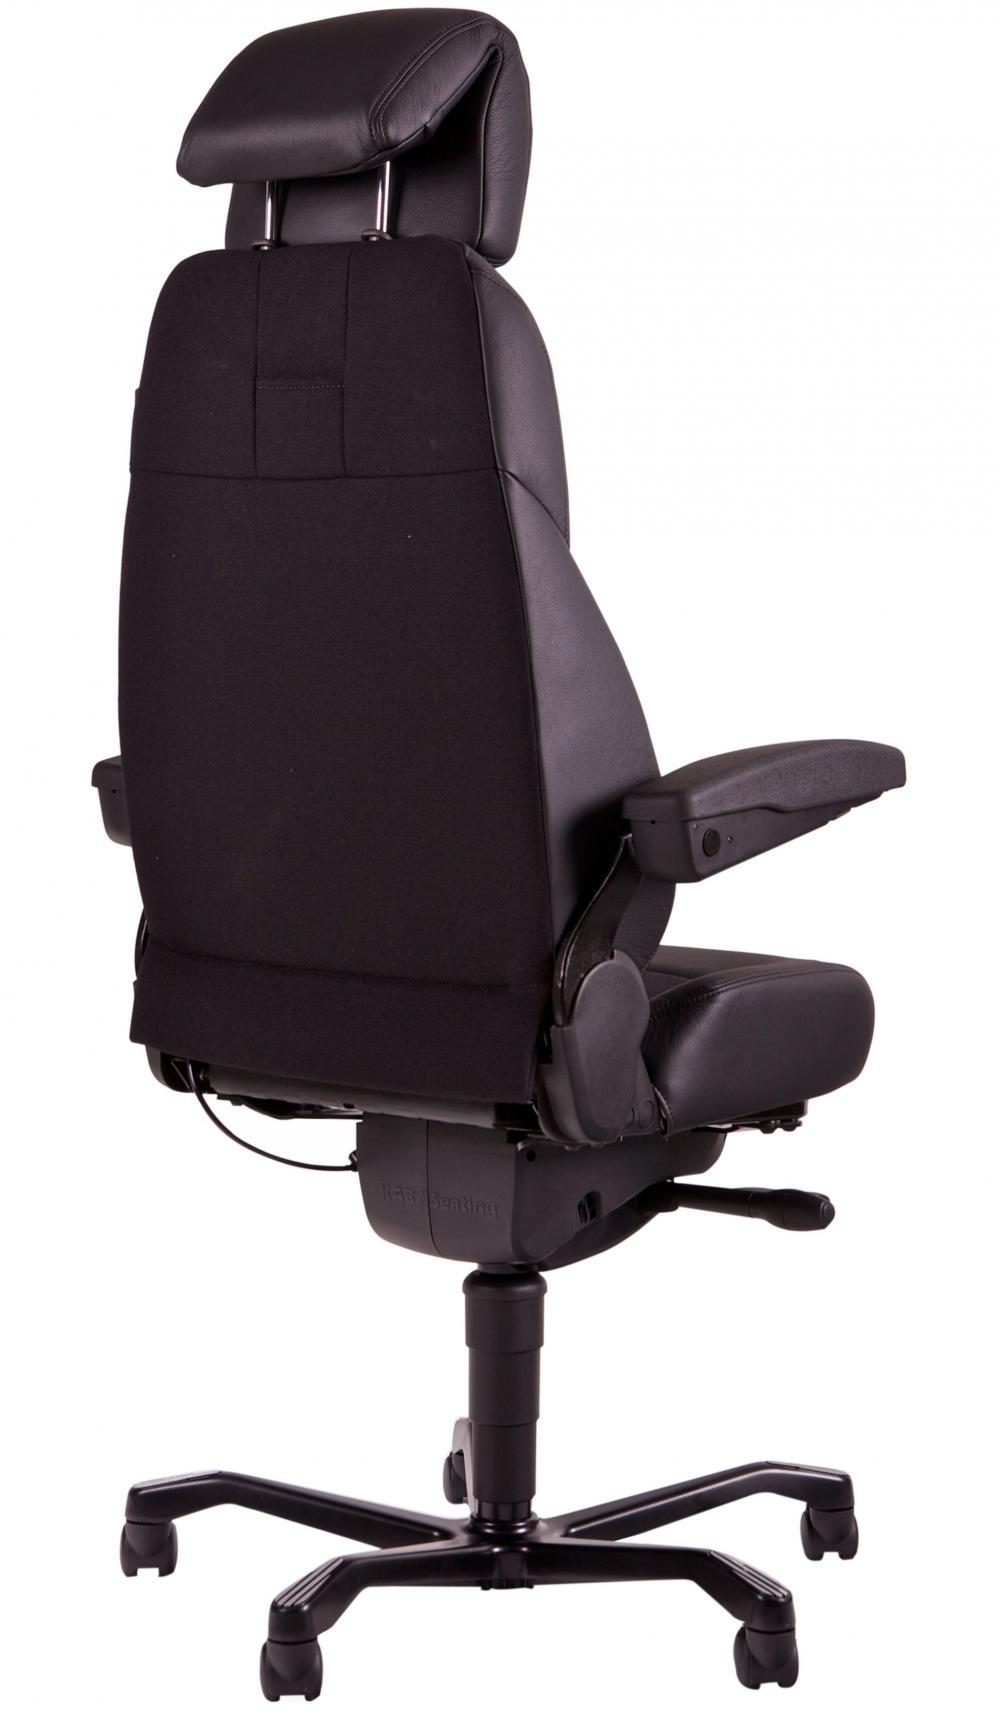 a381m si ge de bureau 24 heures a381 tissu mix burodepo. Black Bedroom Furniture Sets. Home Design Ideas